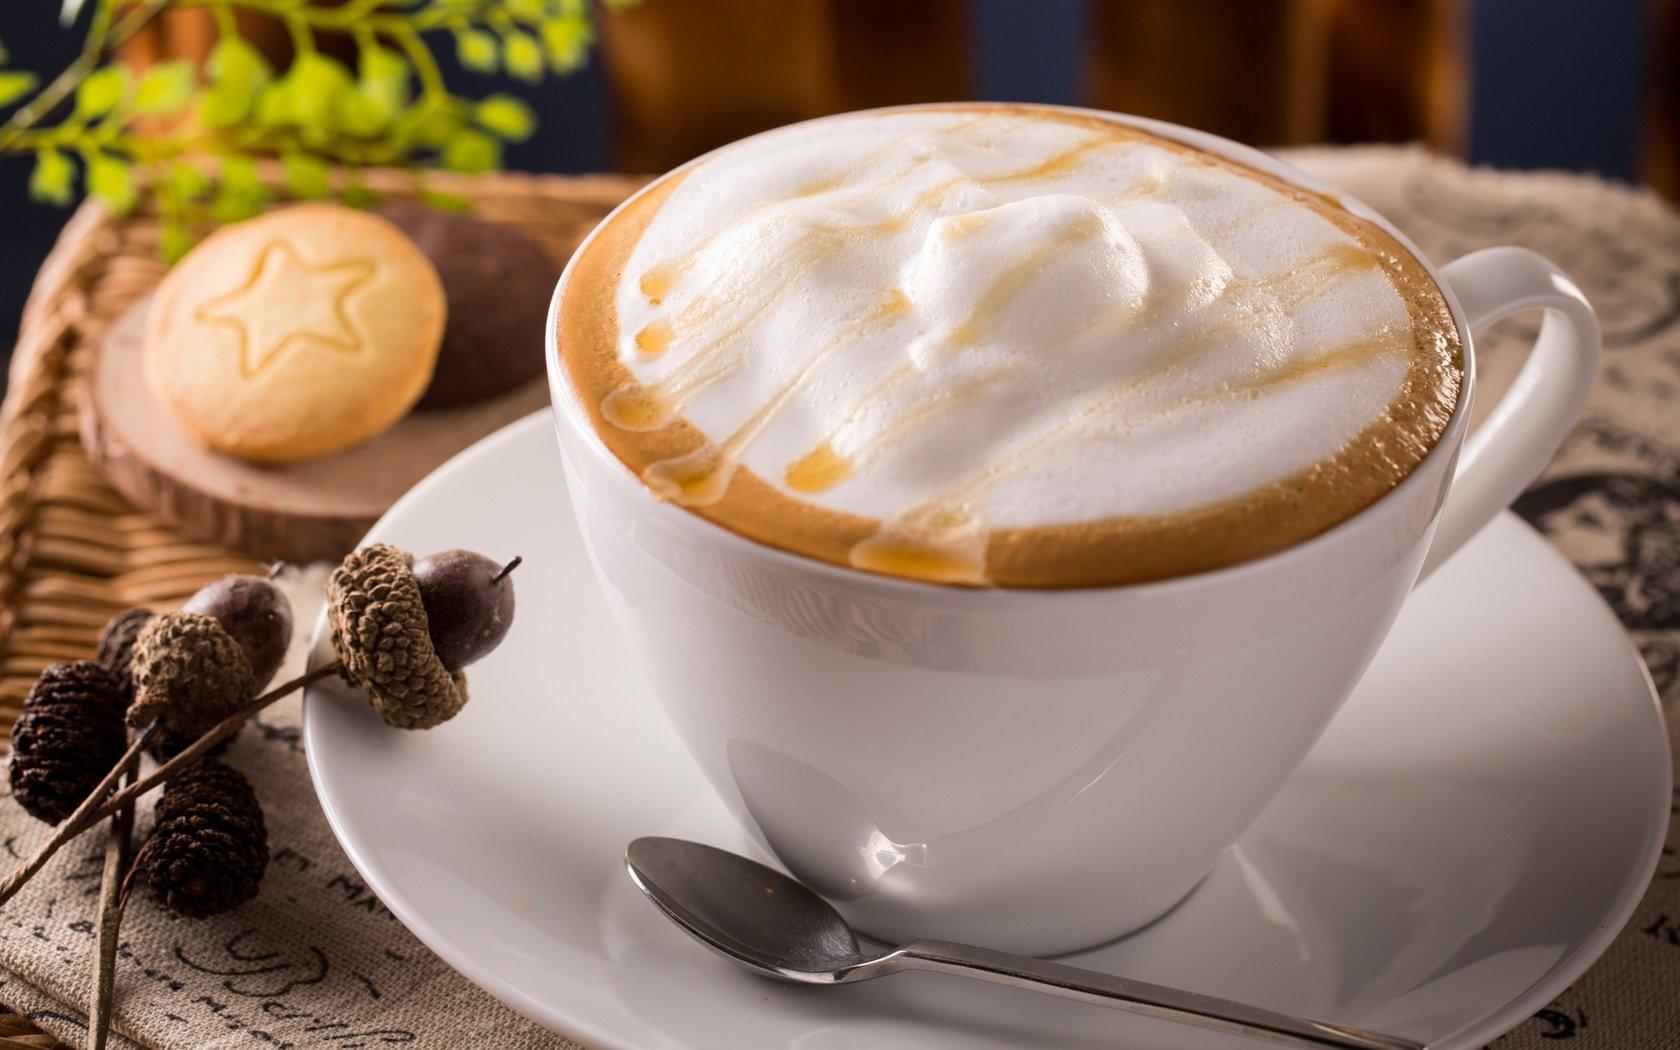 Кафе в Приморском районе. Метро Беговая